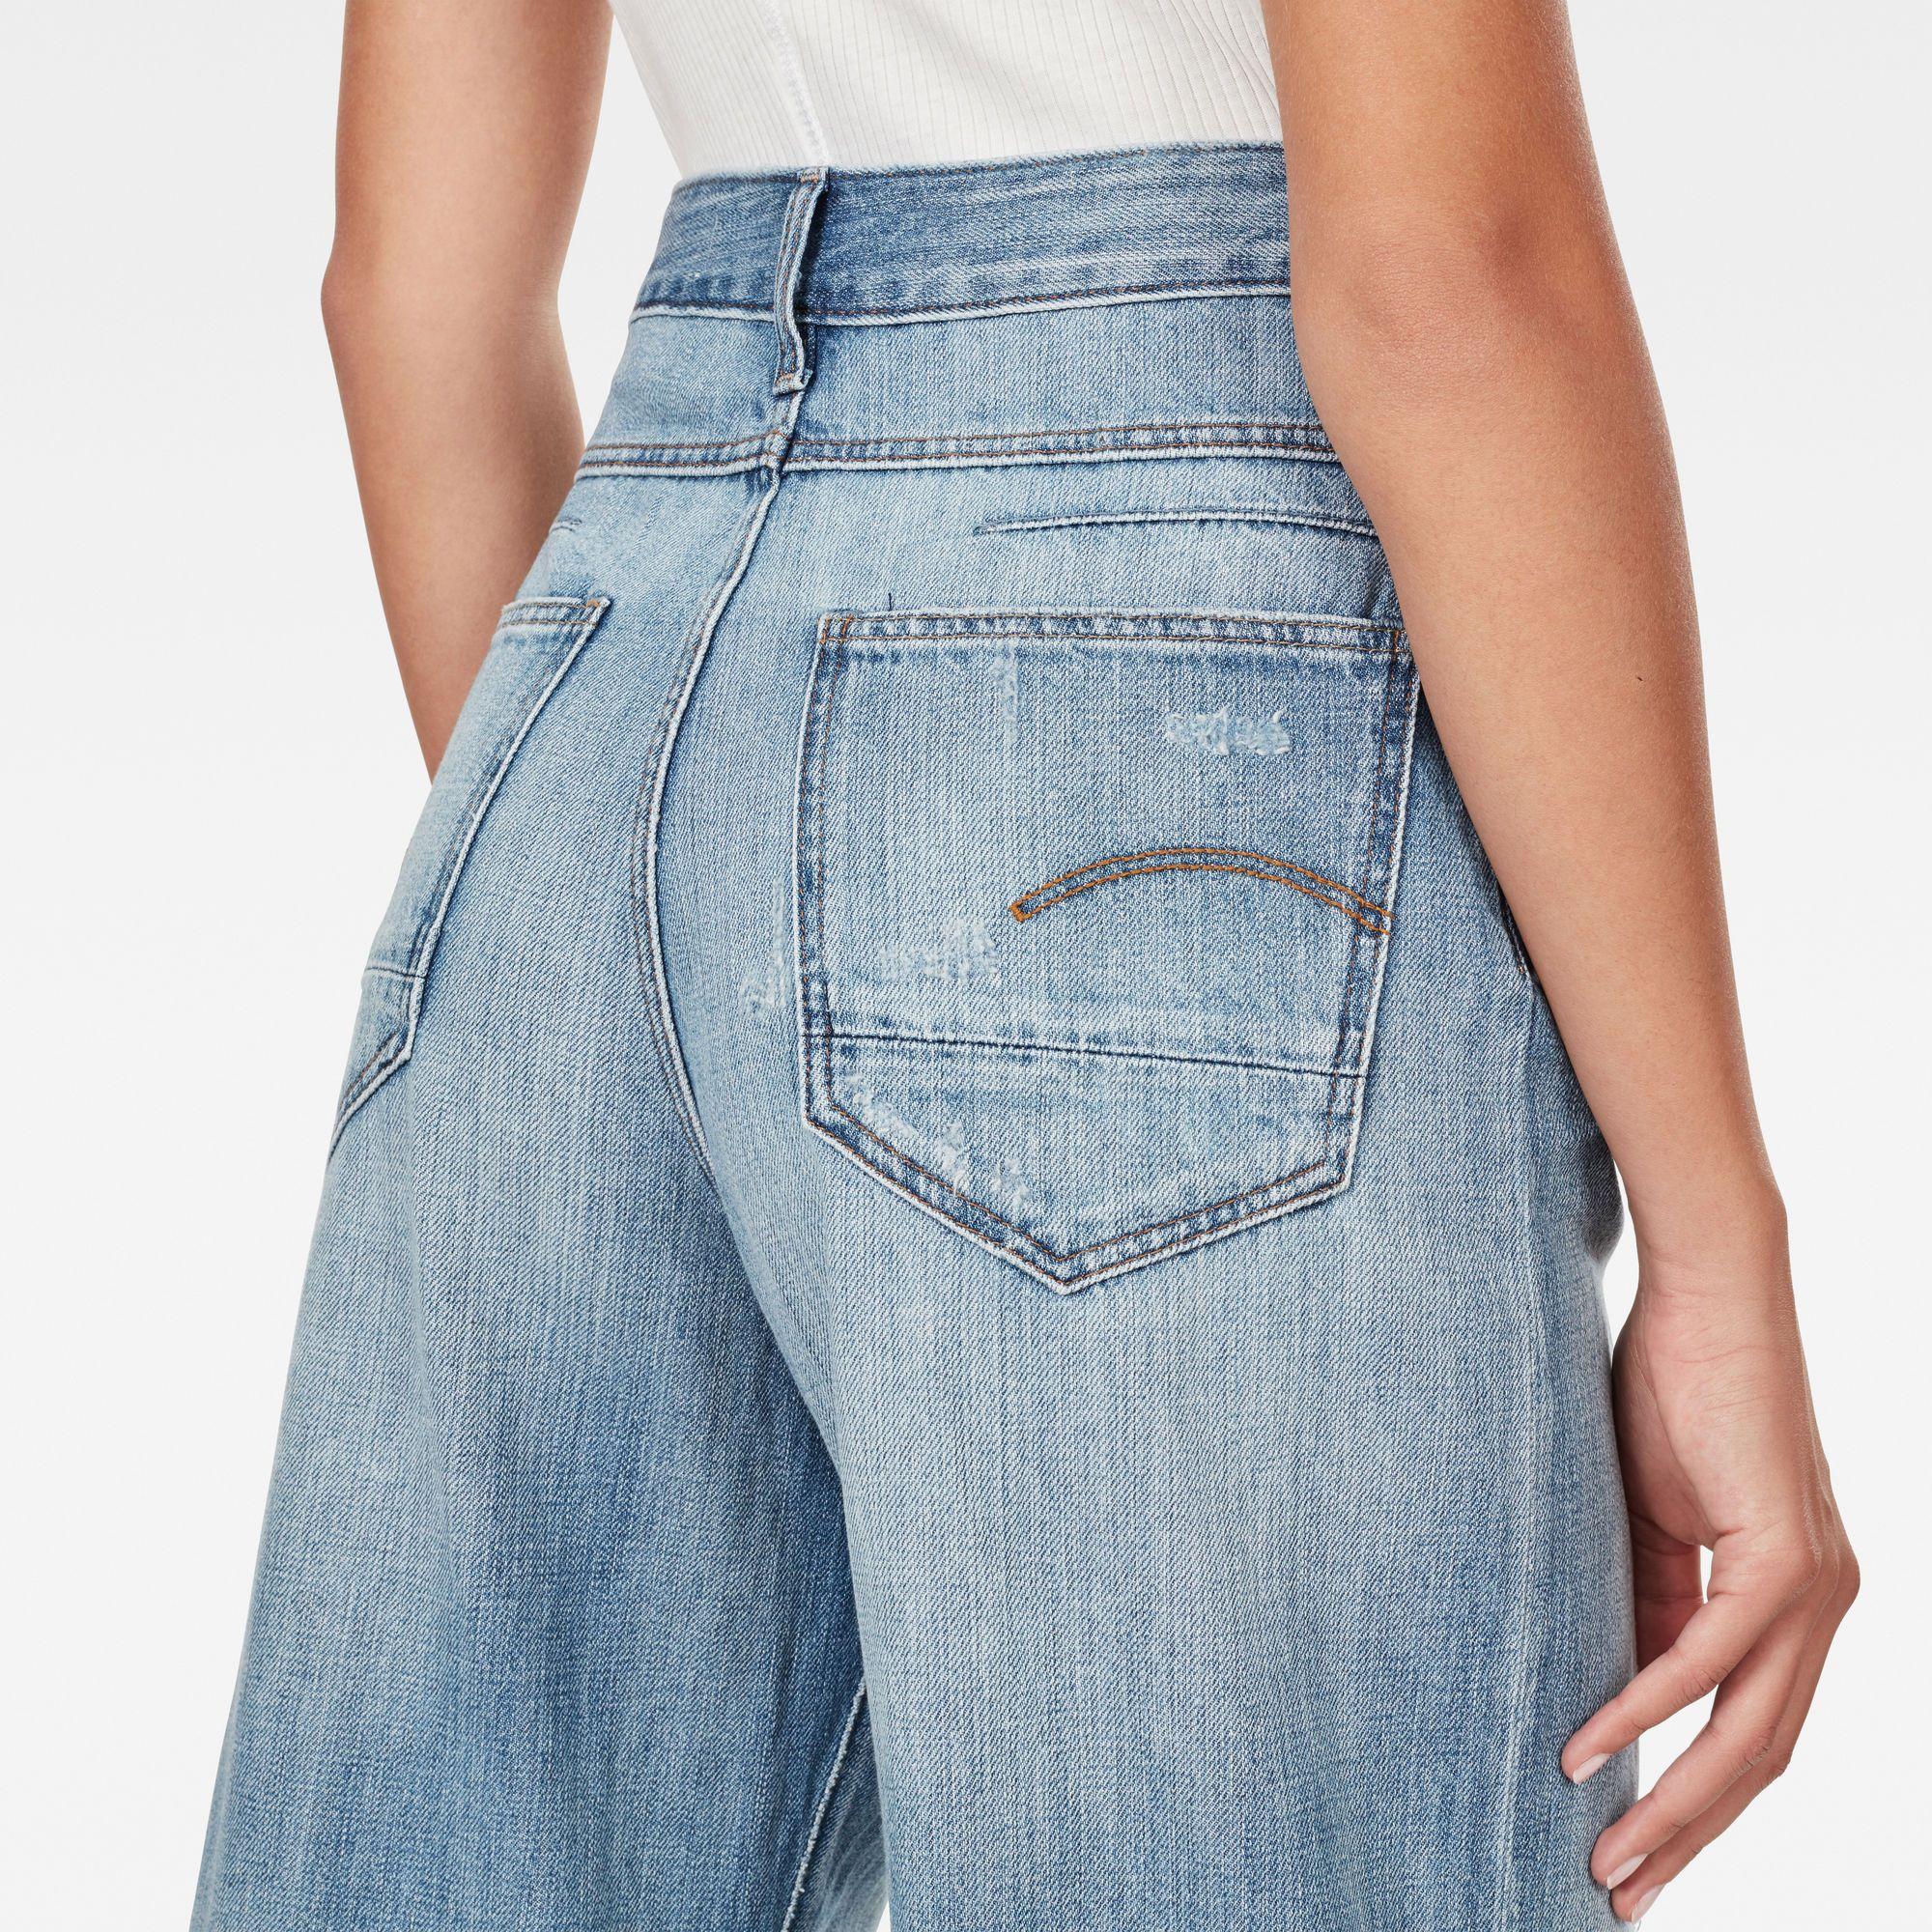 G-Star RAW D-Staq 5-Pocket High Waist Wide Leg Jeans